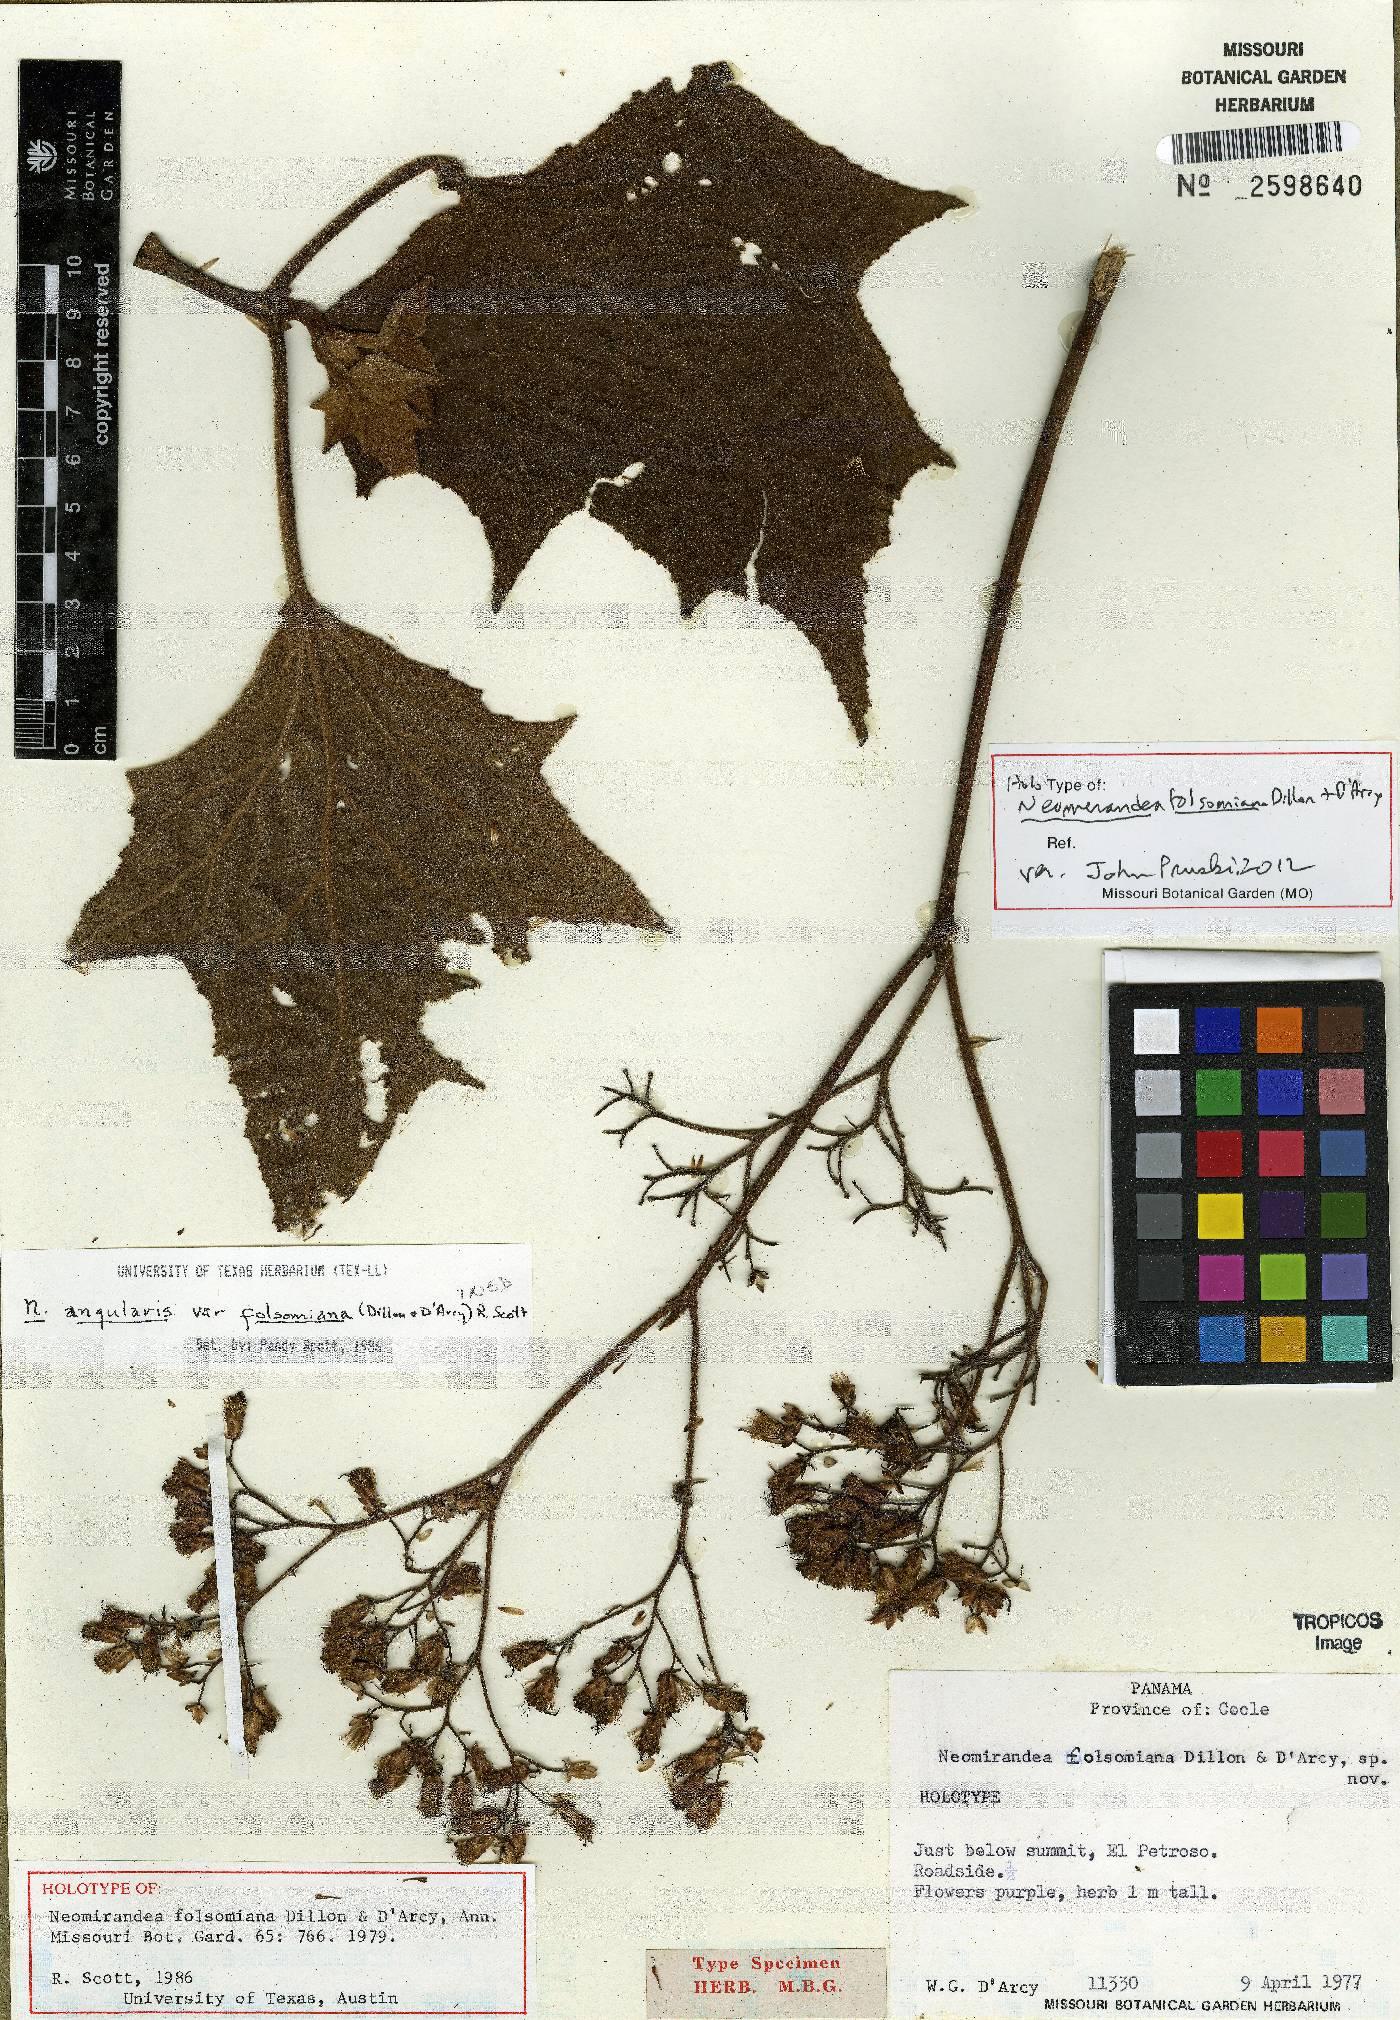 Neomirandea folsomiana image